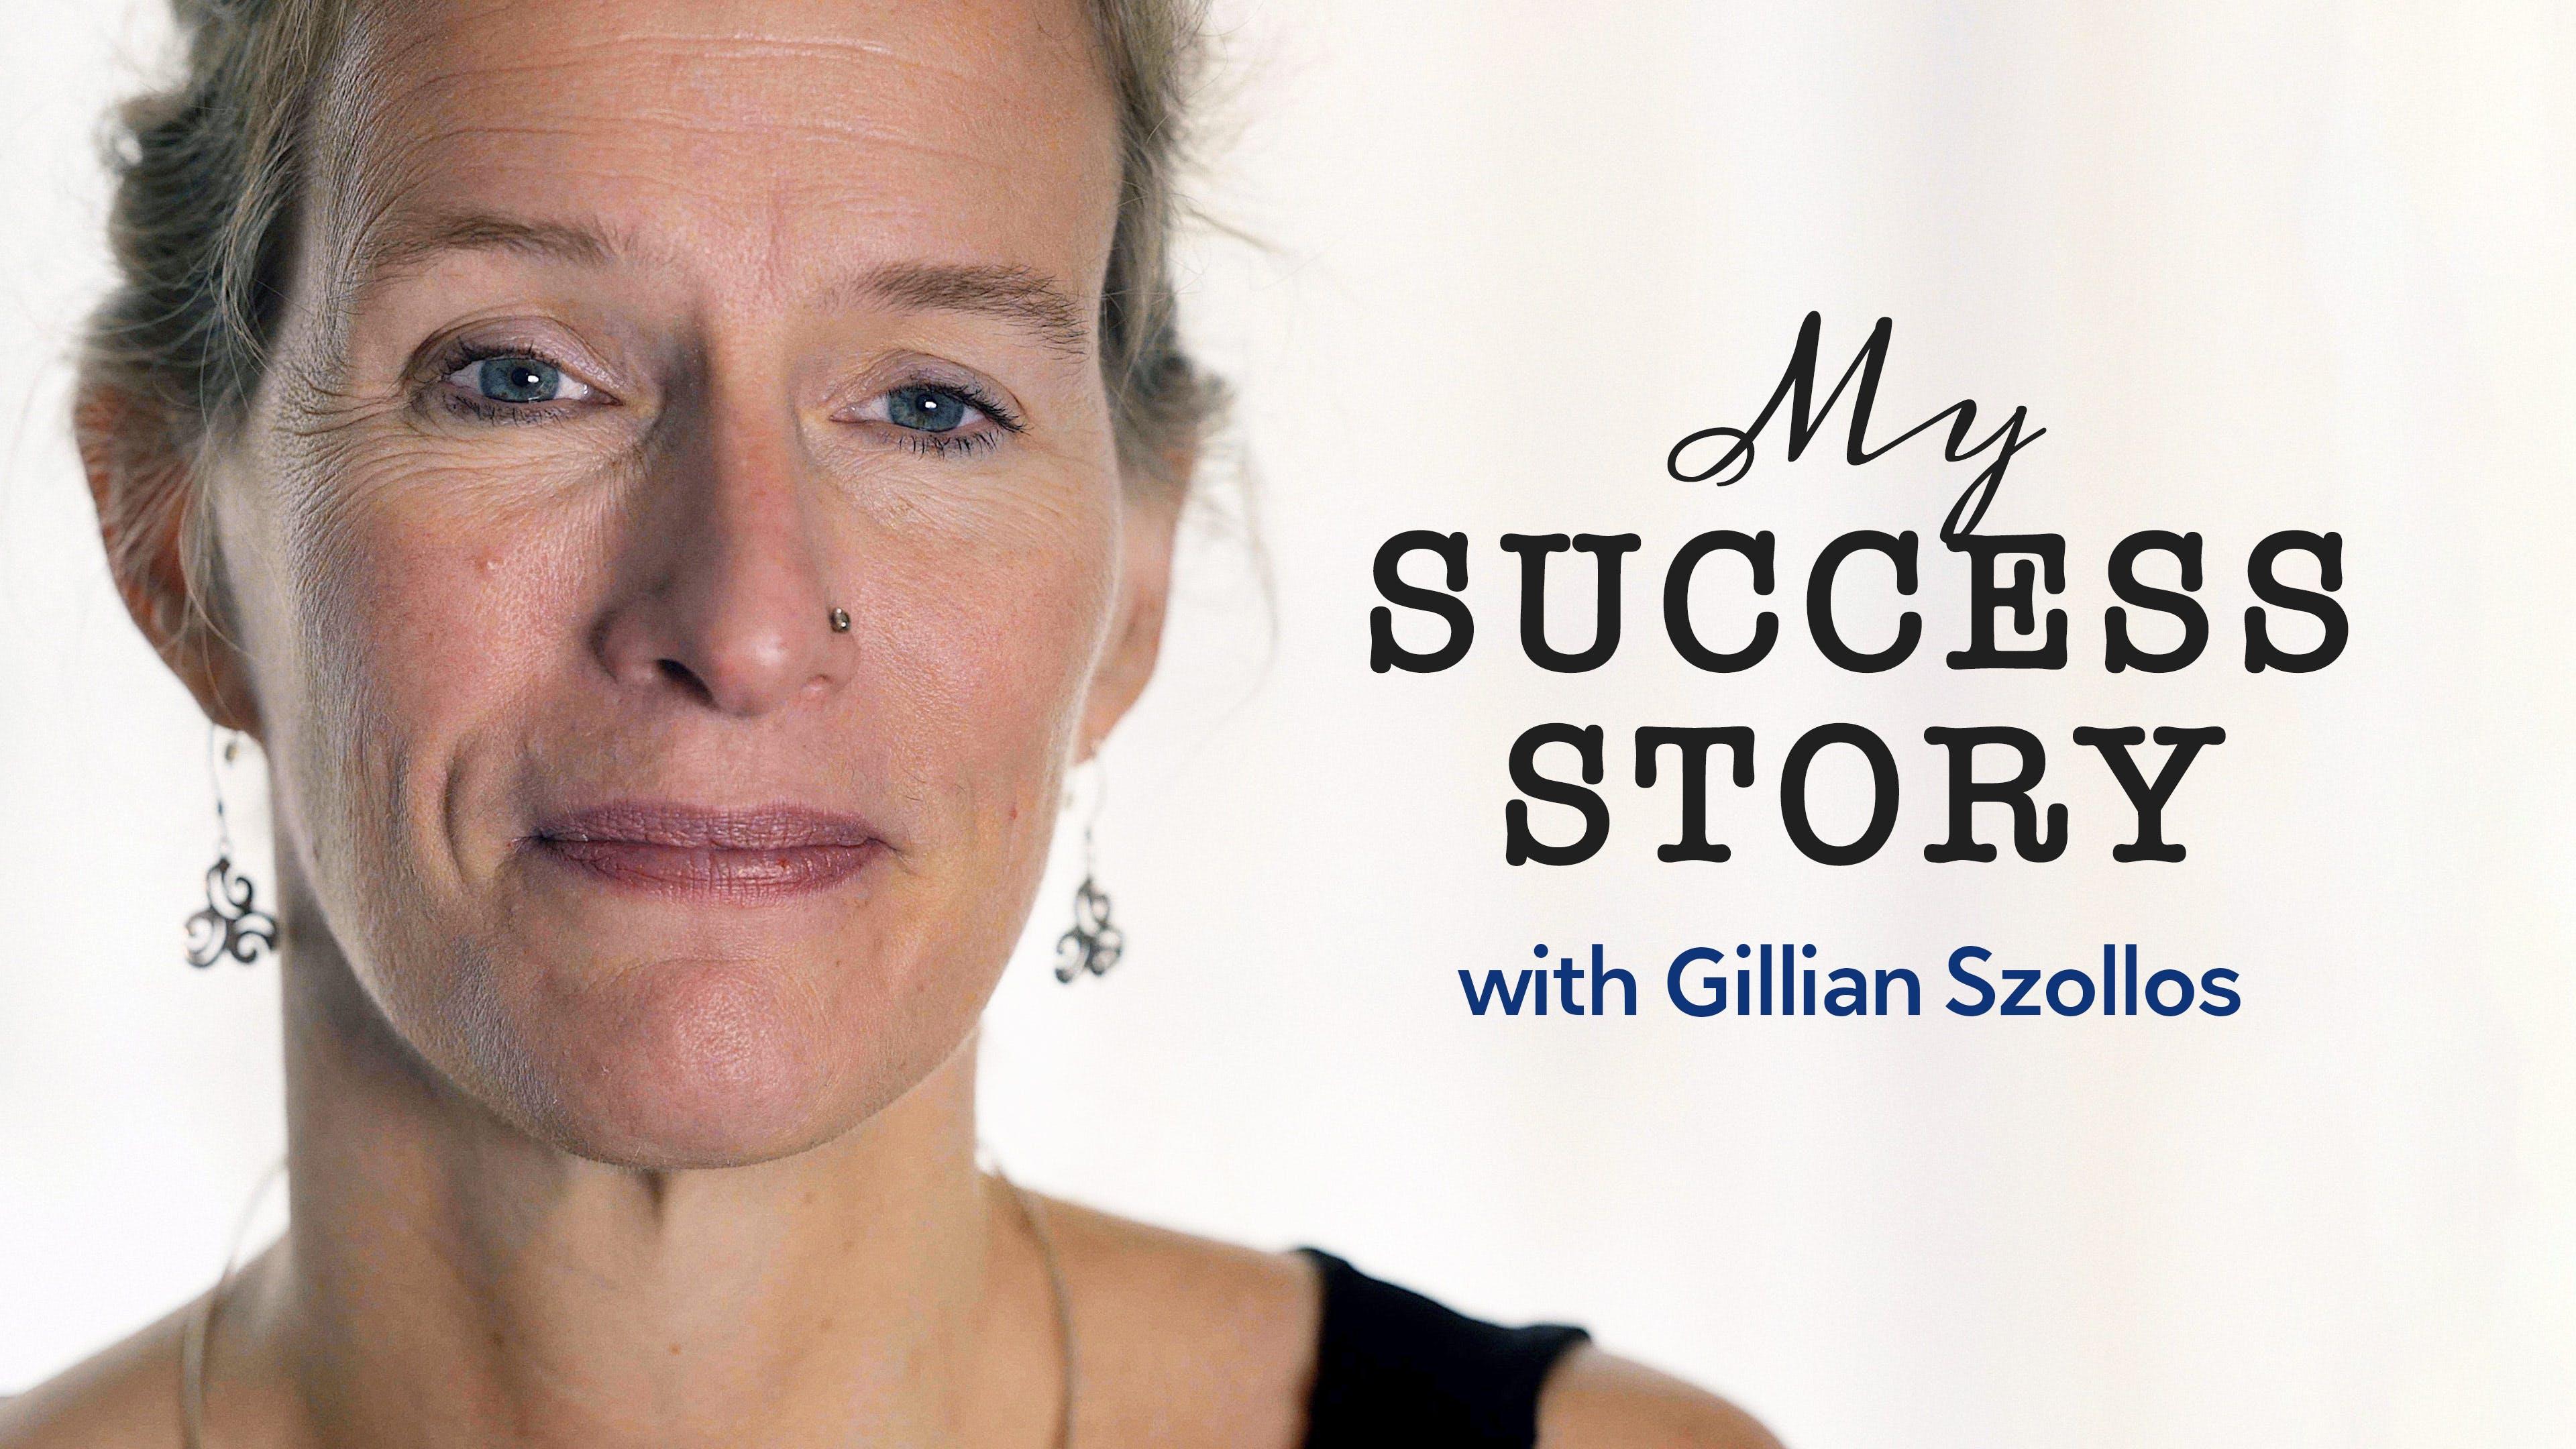 THUMBNAIL – Gillian Success Story